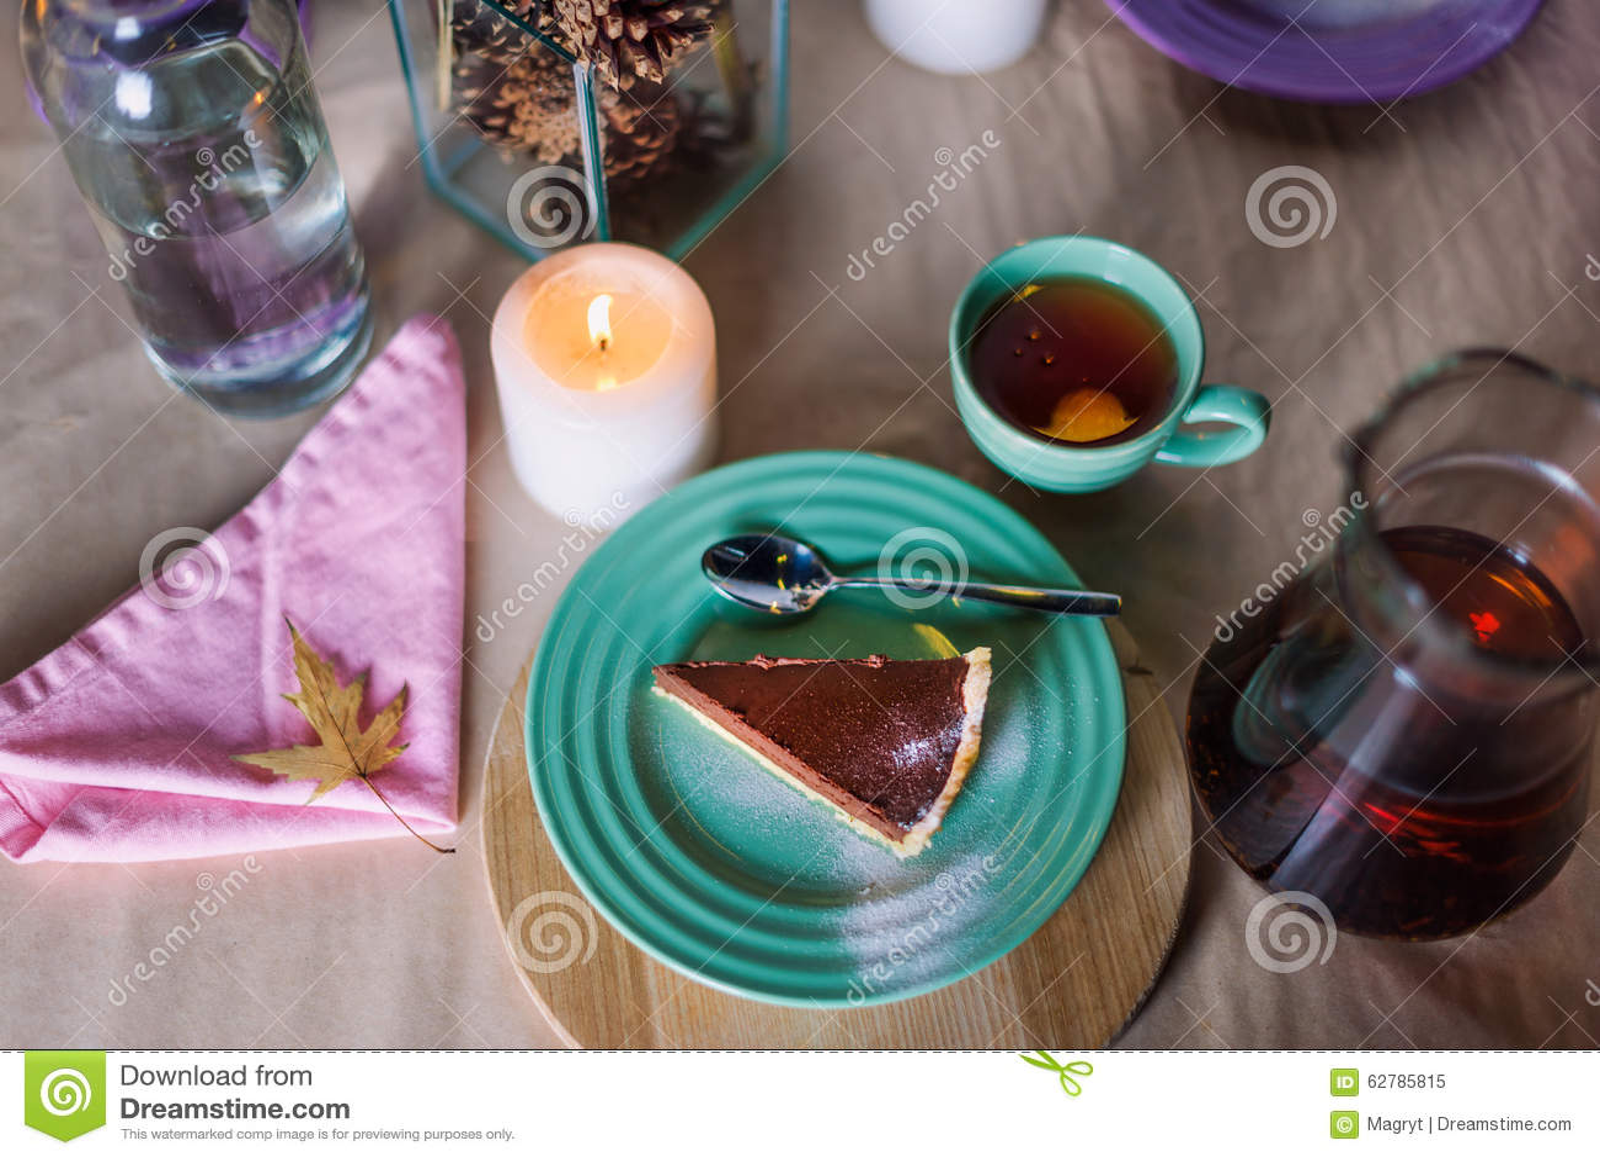 Birthday Cake Tea Calories